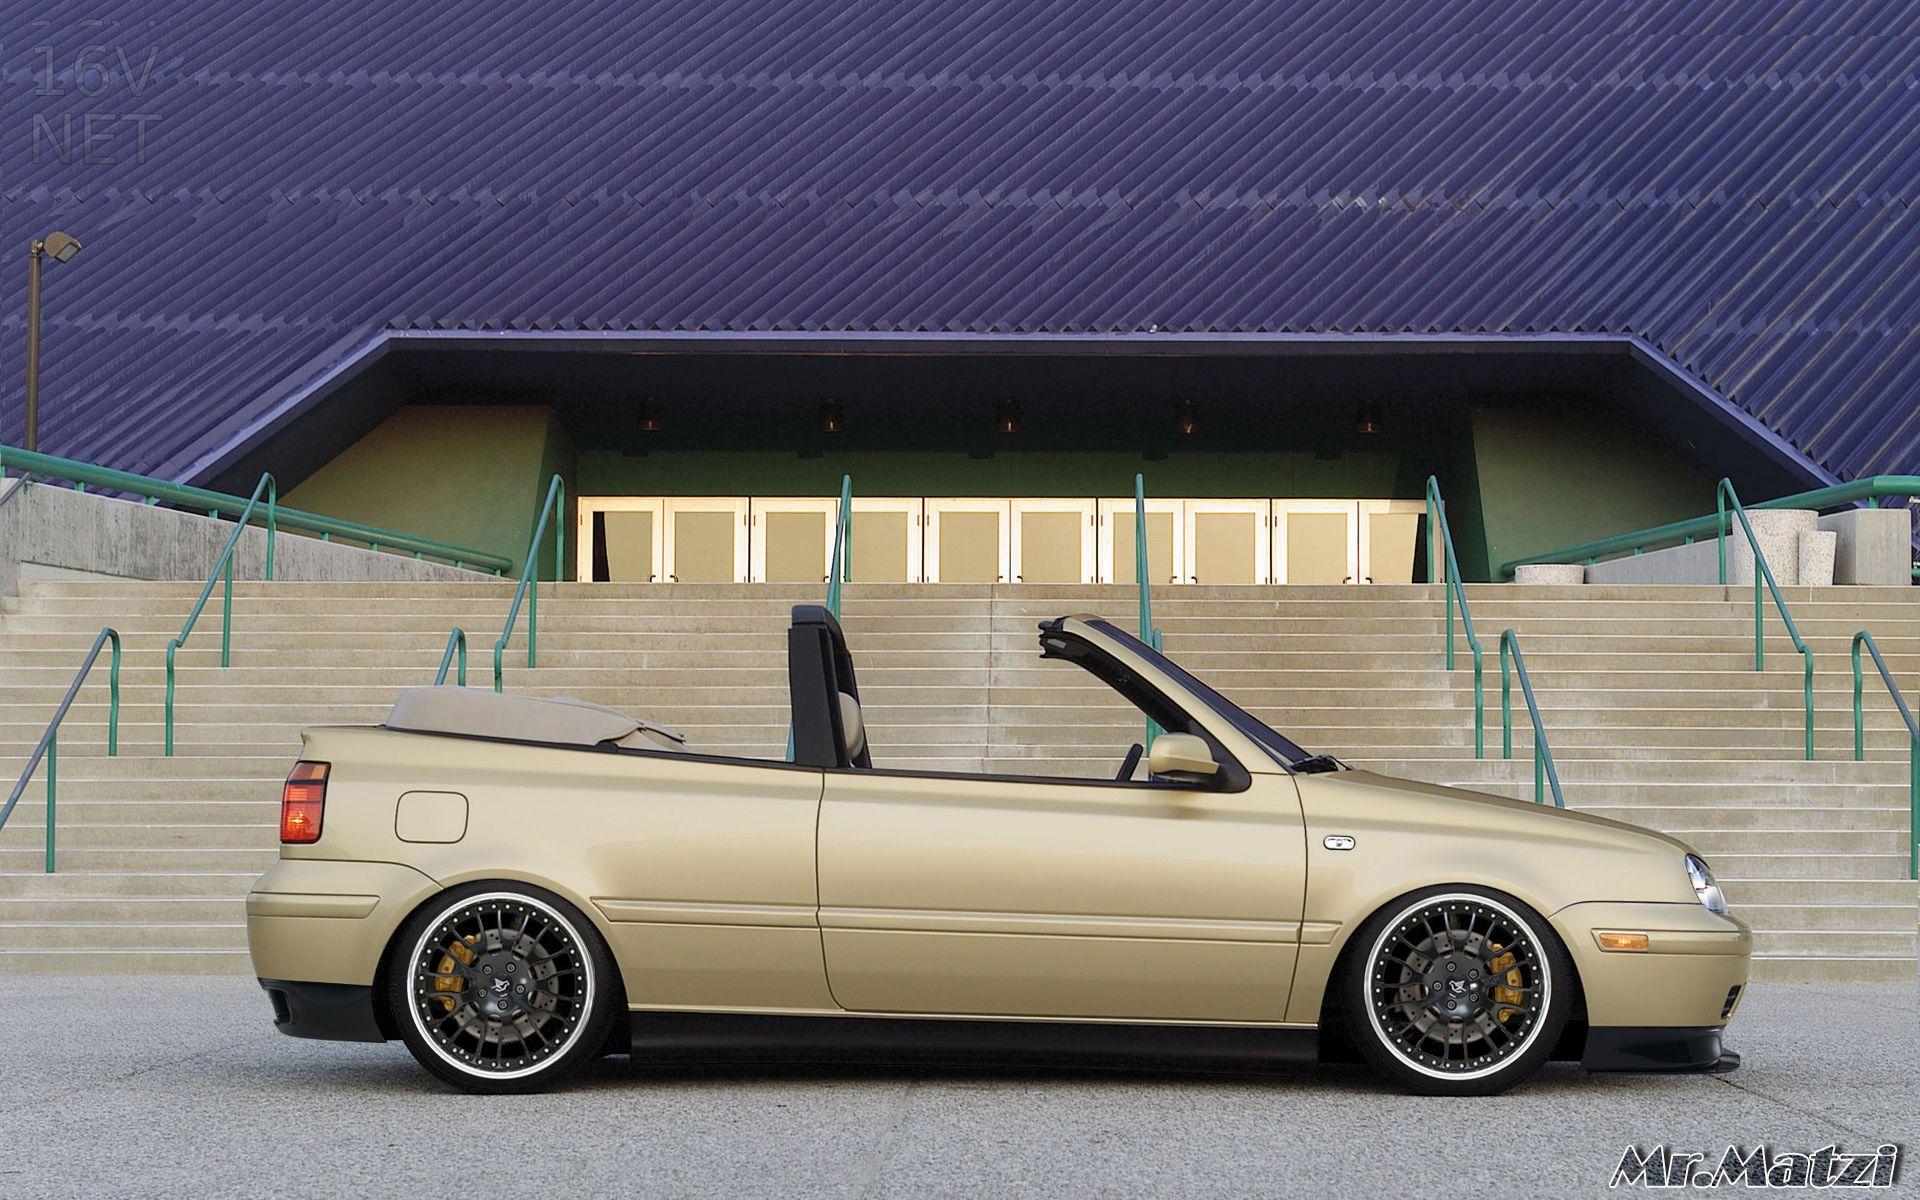 afbeeldingsresultaat voor golf 4 cabriolet tuning mk4. Black Bedroom Furniture Sets. Home Design Ideas